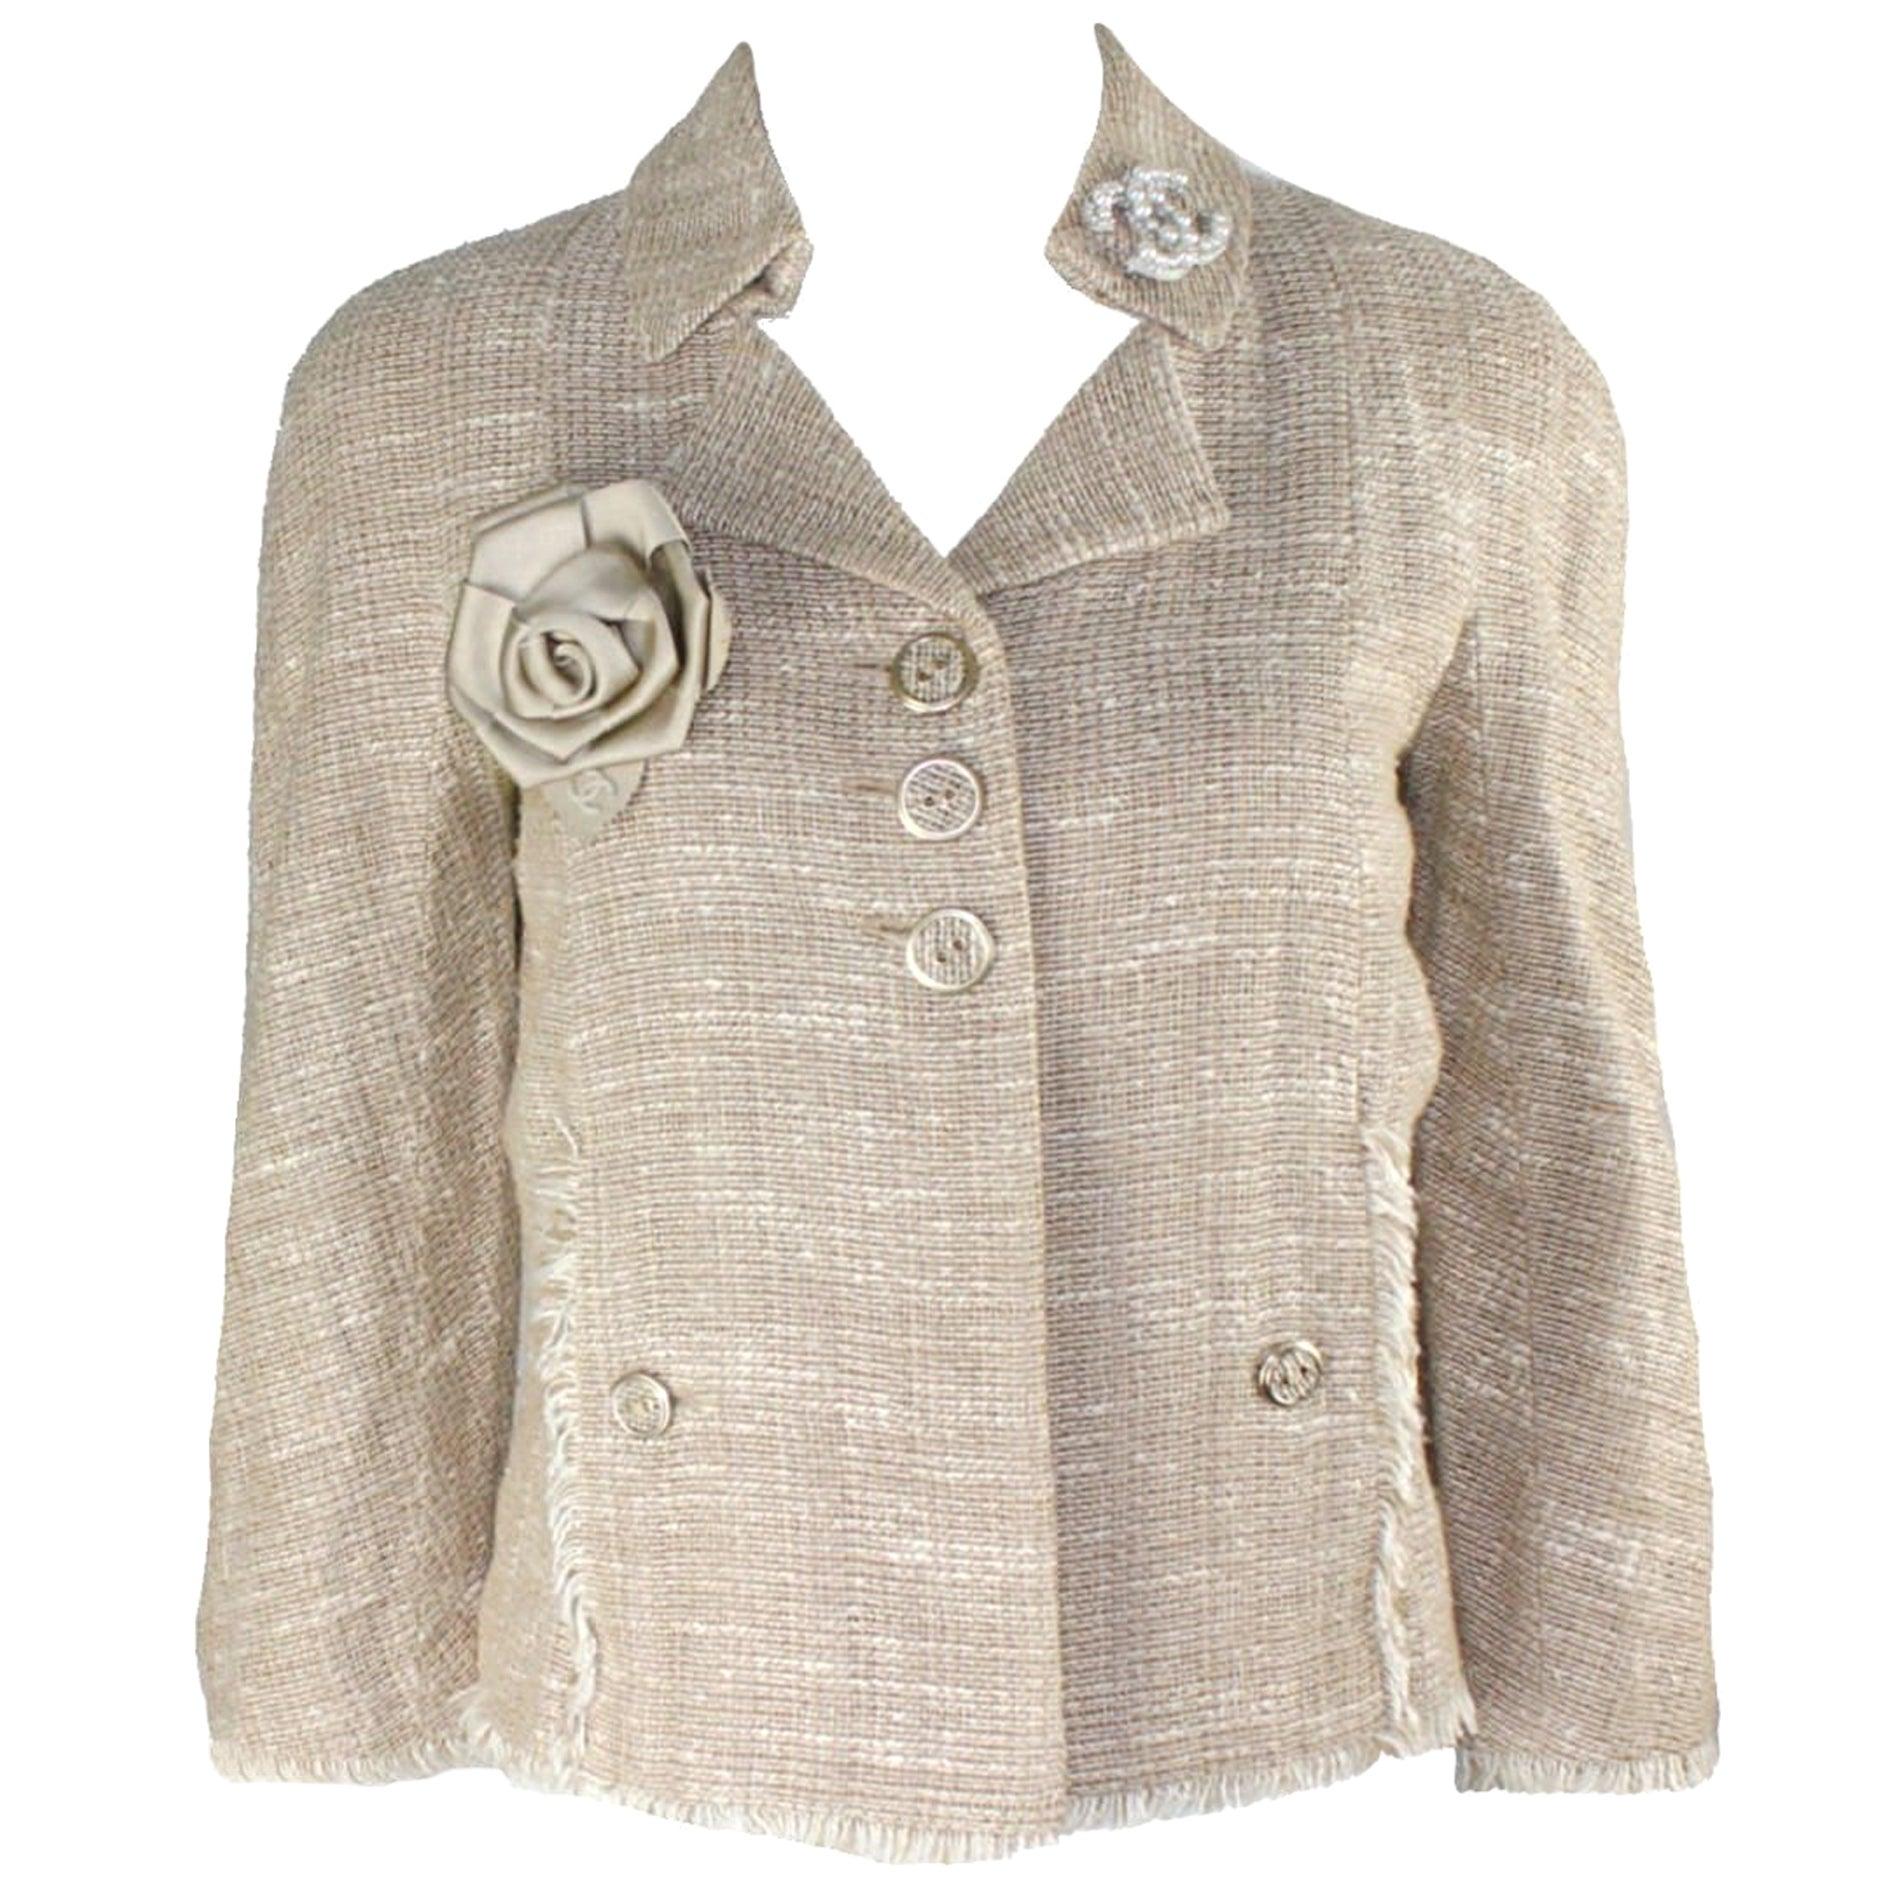 NEW Chanel Linen Fantasy Tweed Fringed Trim Jacket Blazer